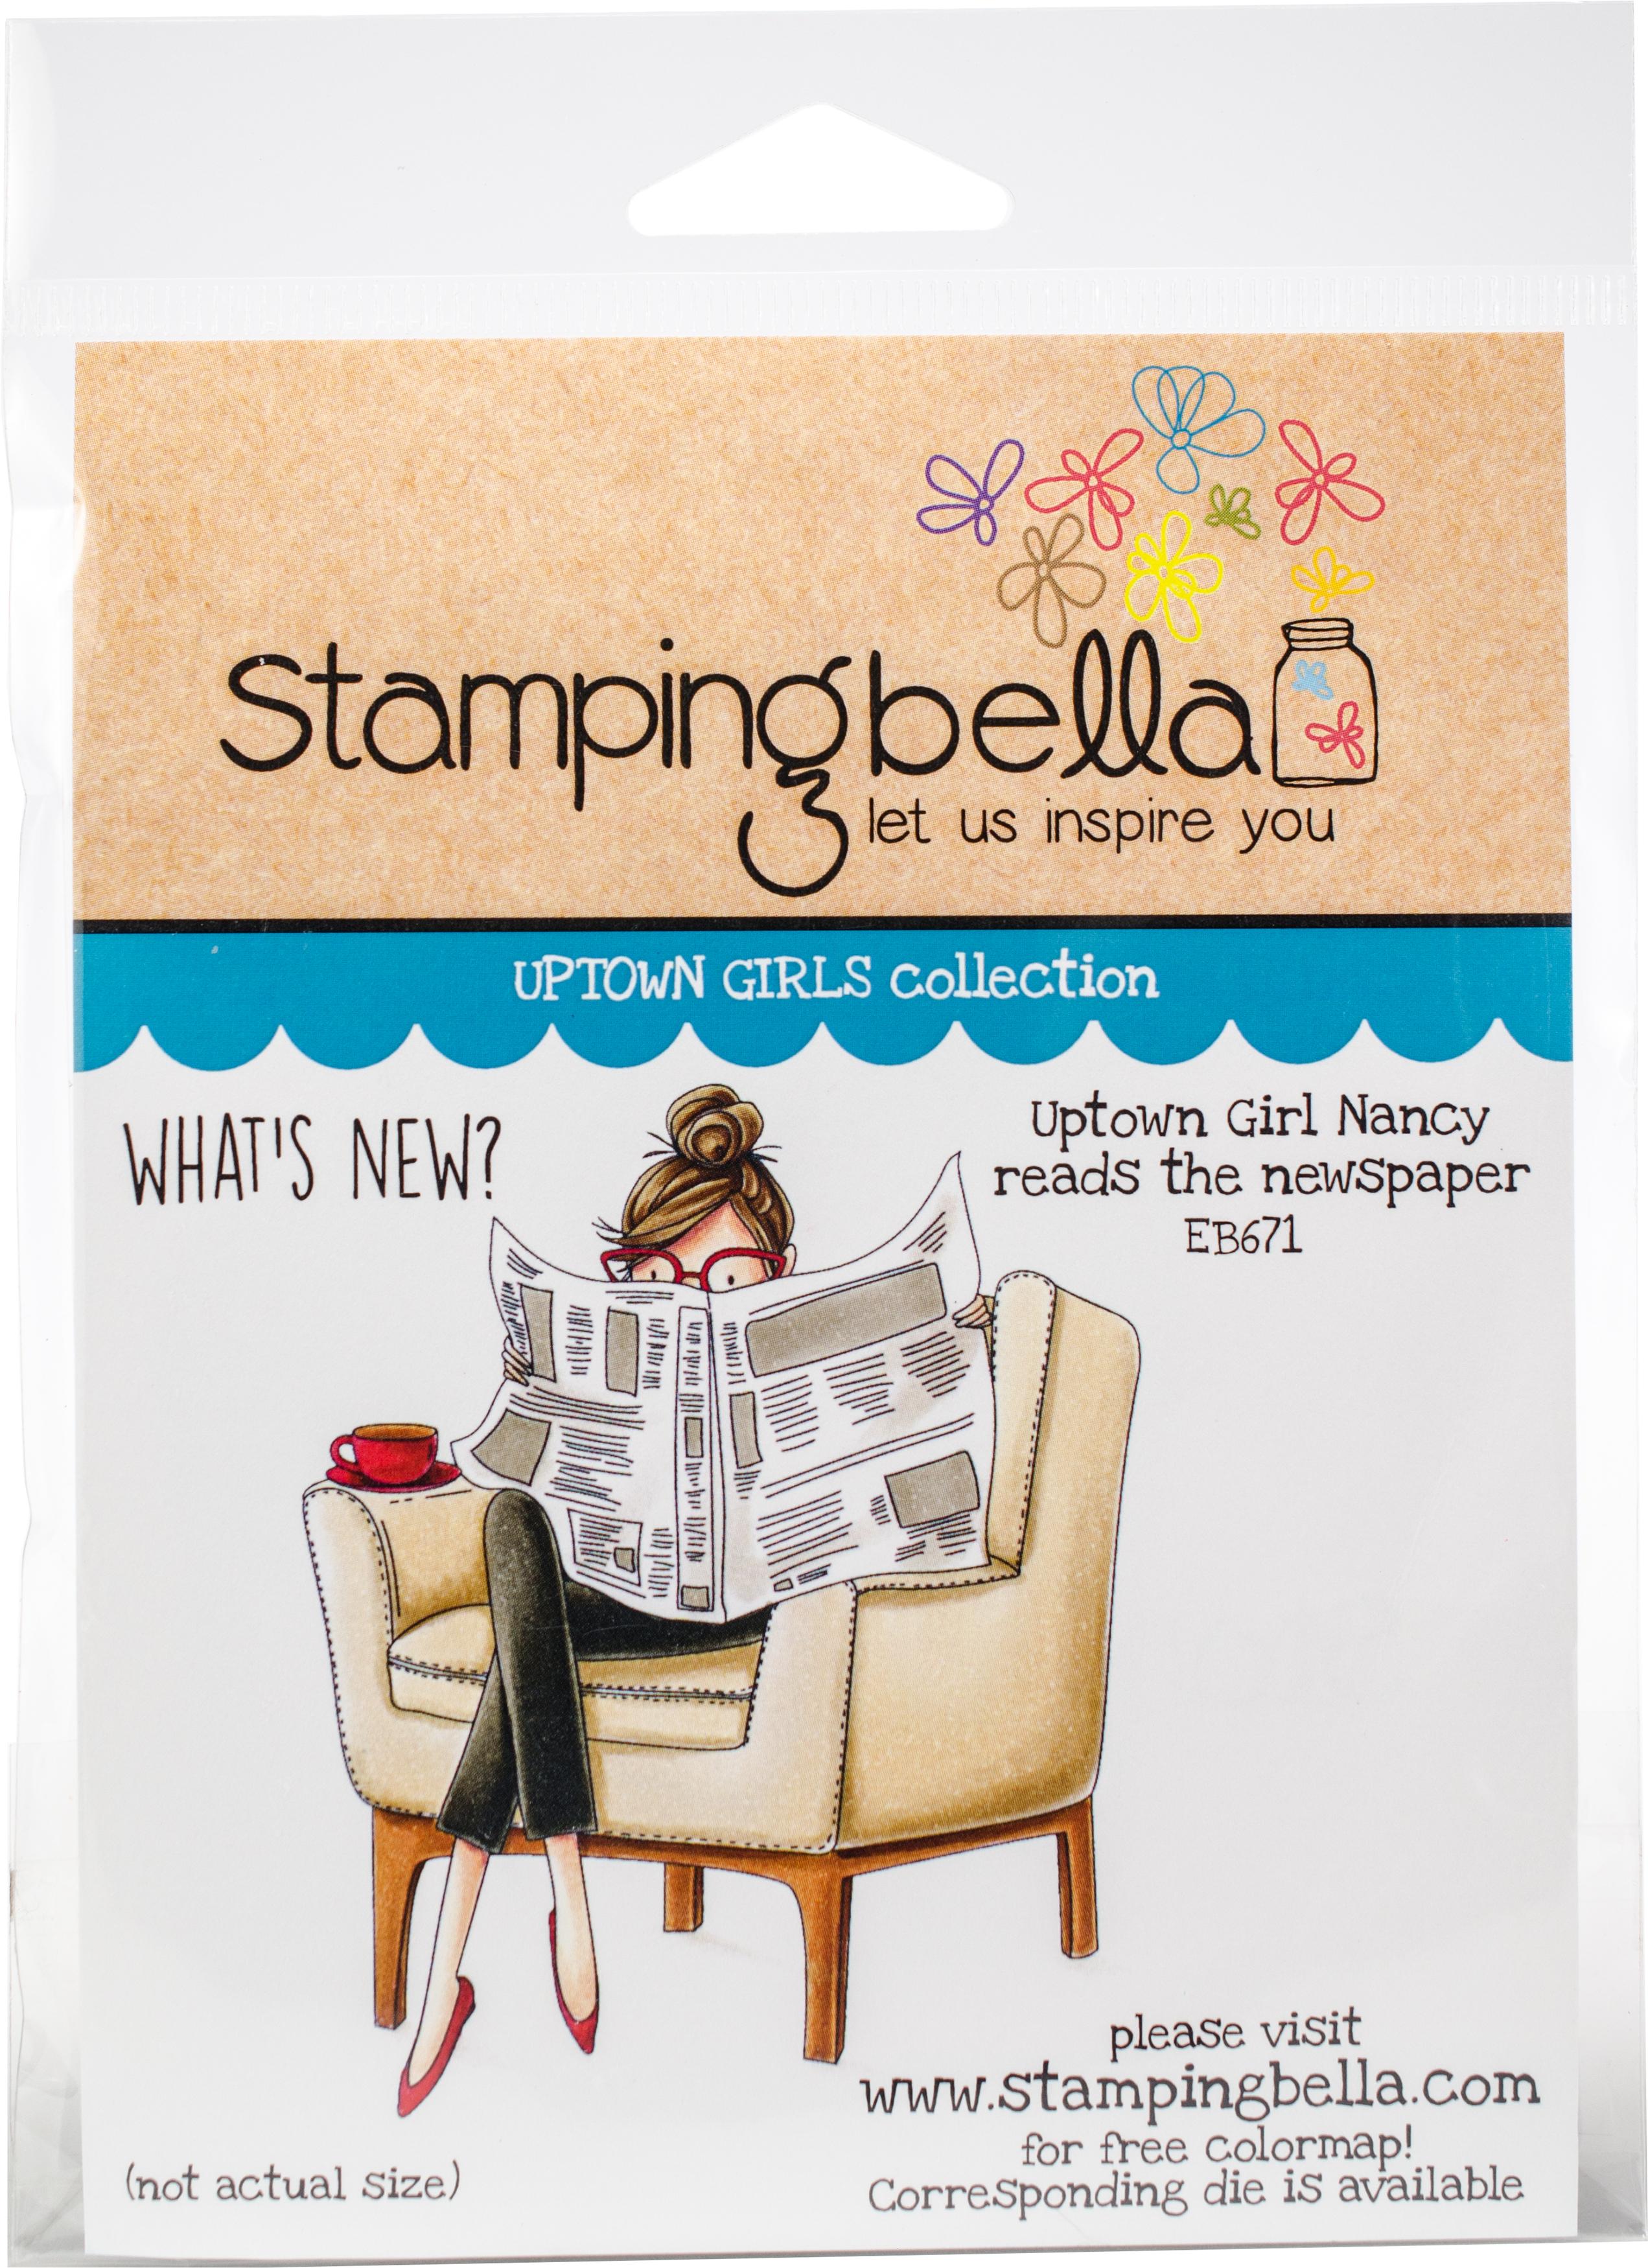 Uptown Girl Nancy Reads The Newspaper Stamp Set